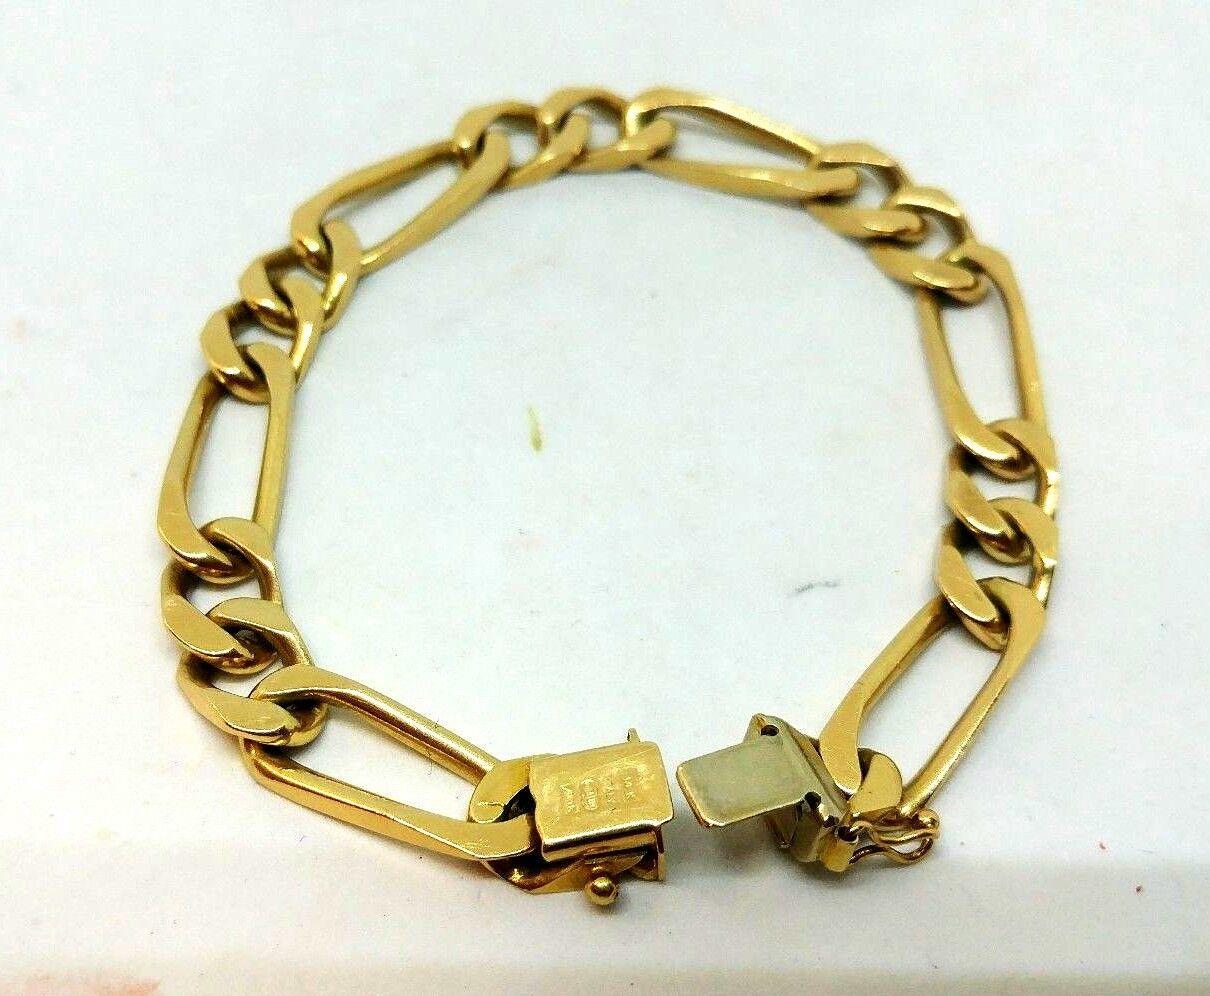 14K YELLOW gold FIGARO LINK BRACELET  7.75   LONG 8.67mm Wide 28.32 grams